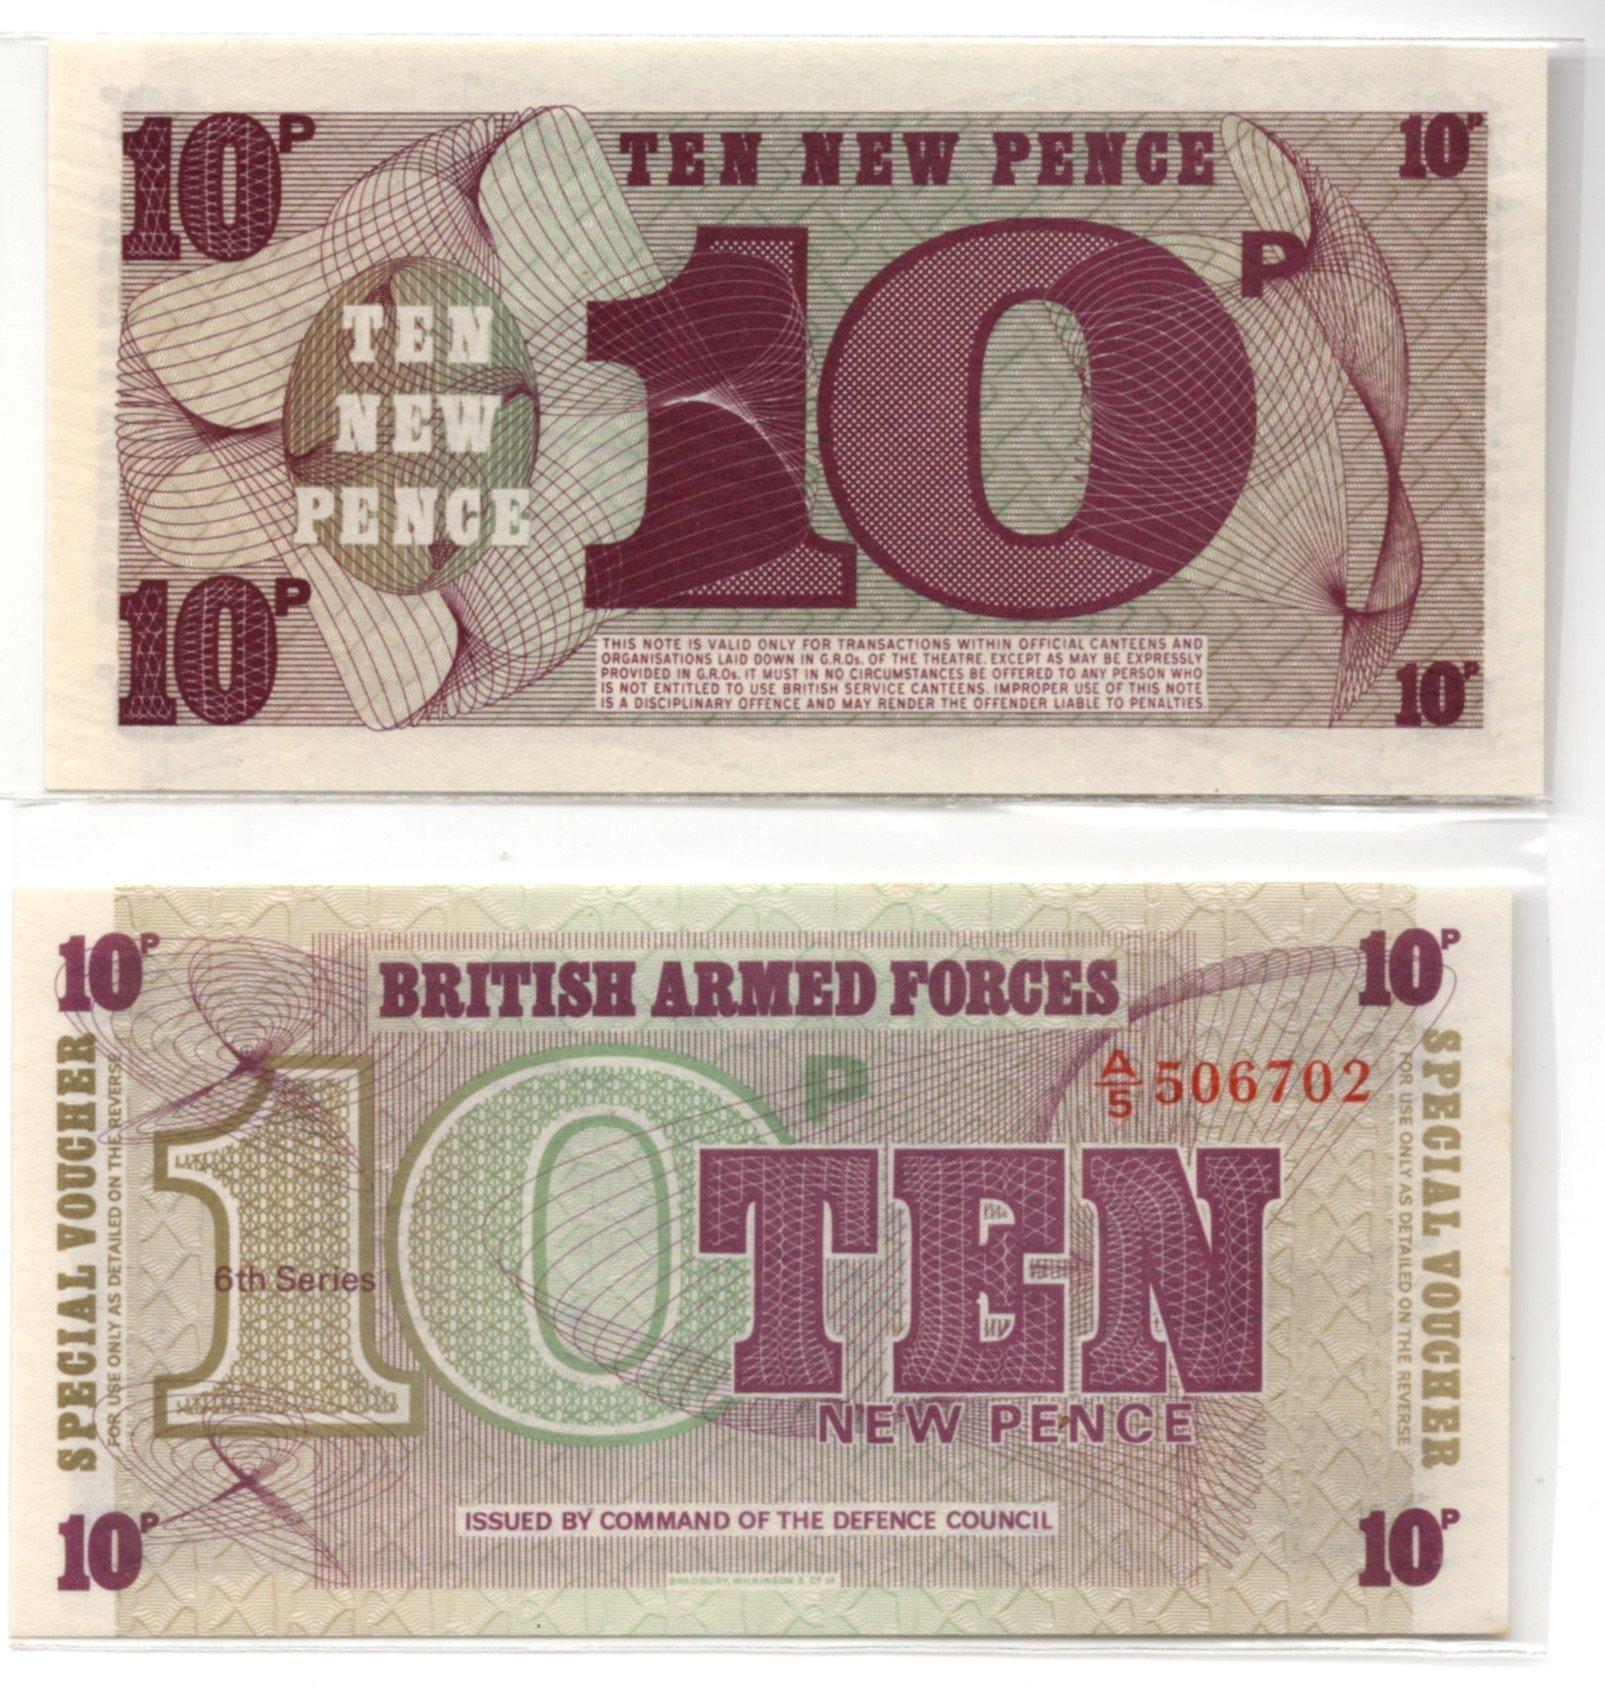 BAF 10 new pence